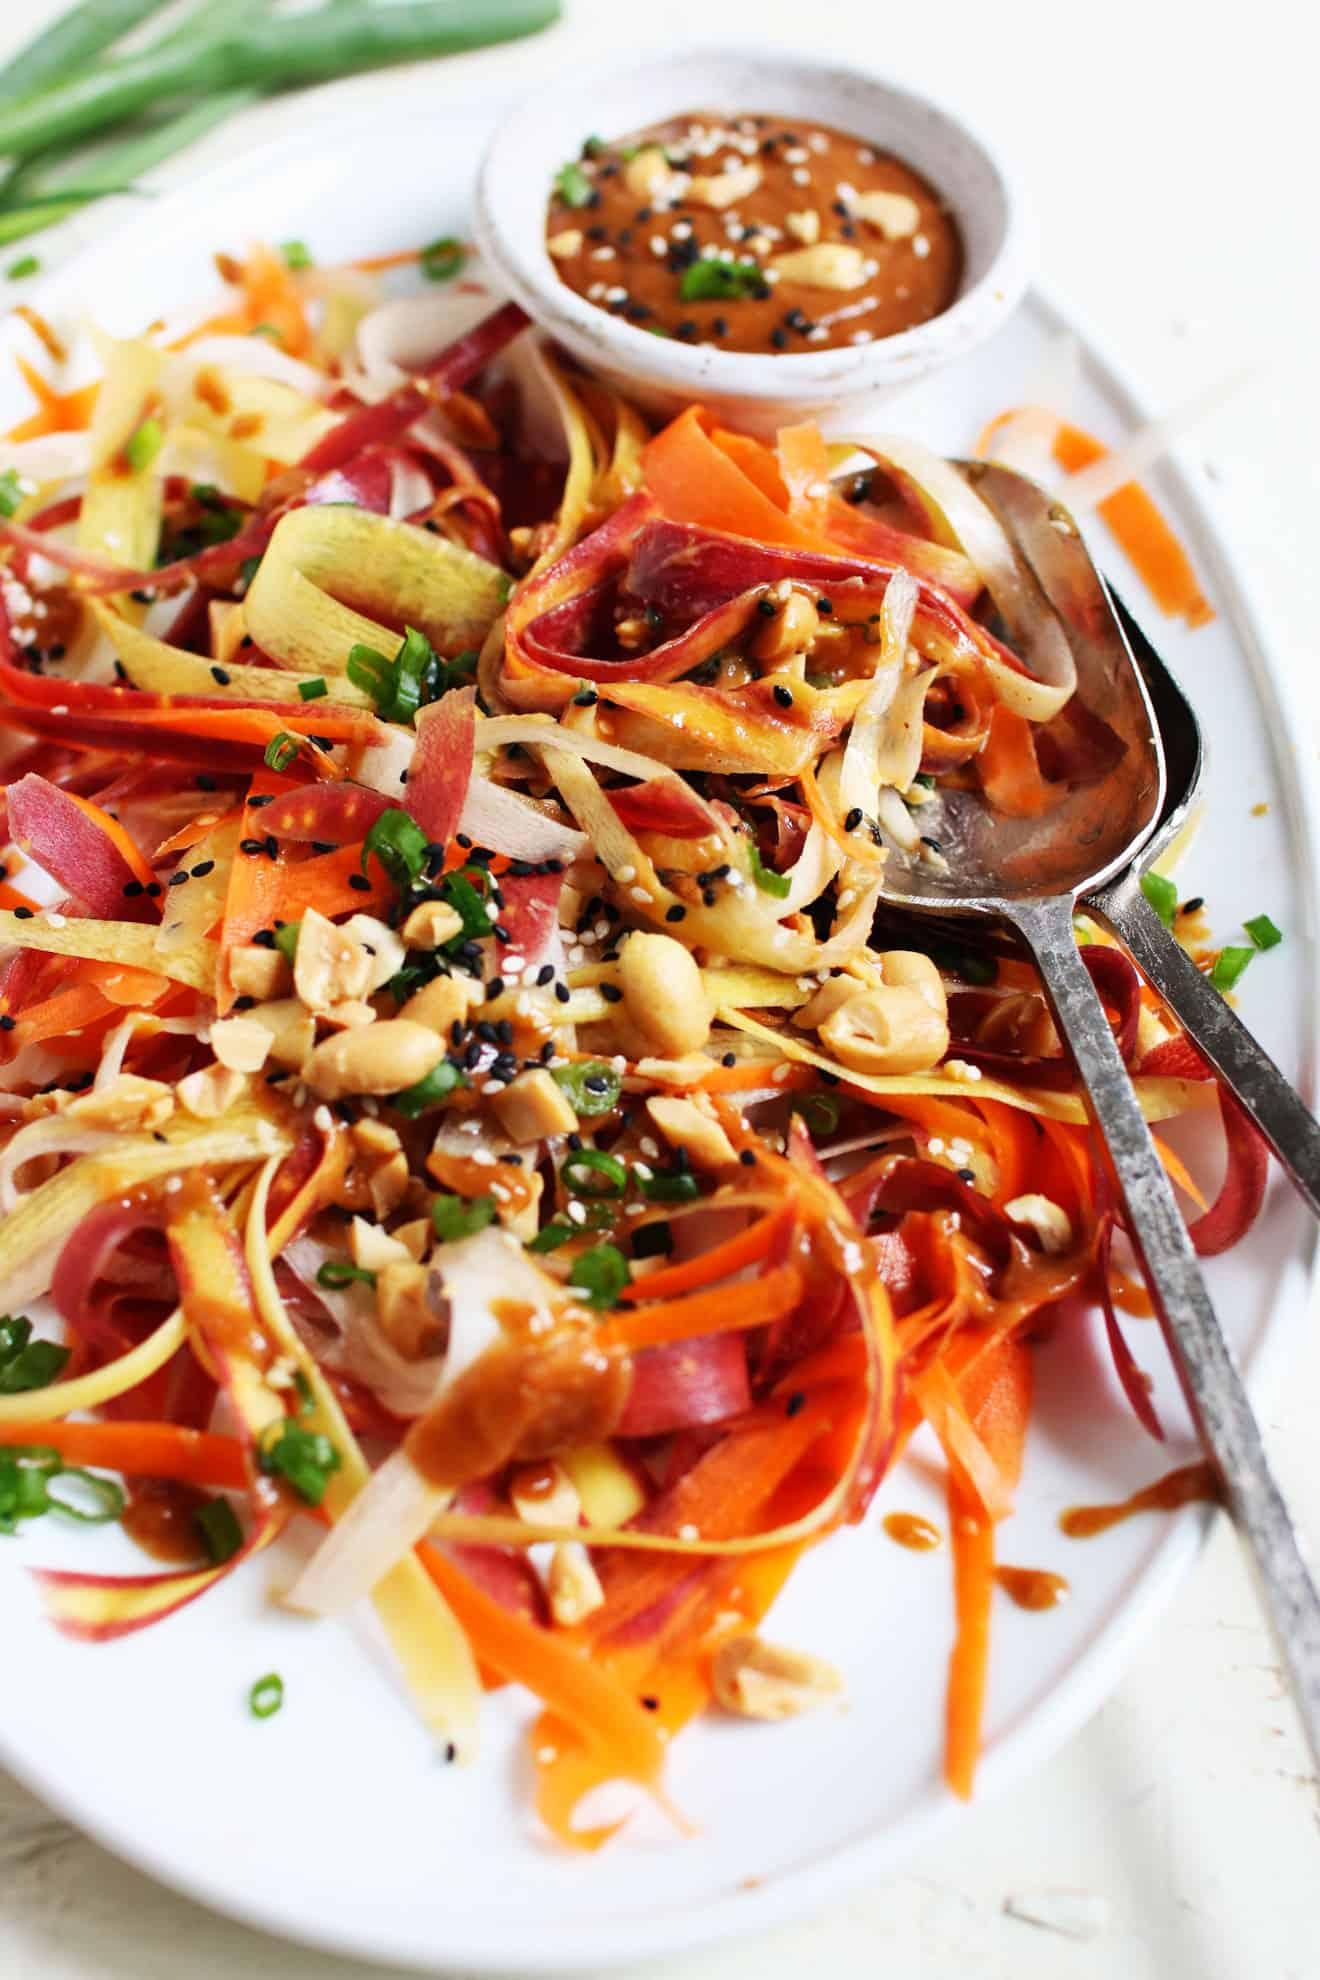 Ribbon Carrot Salad + Peanut Sauce